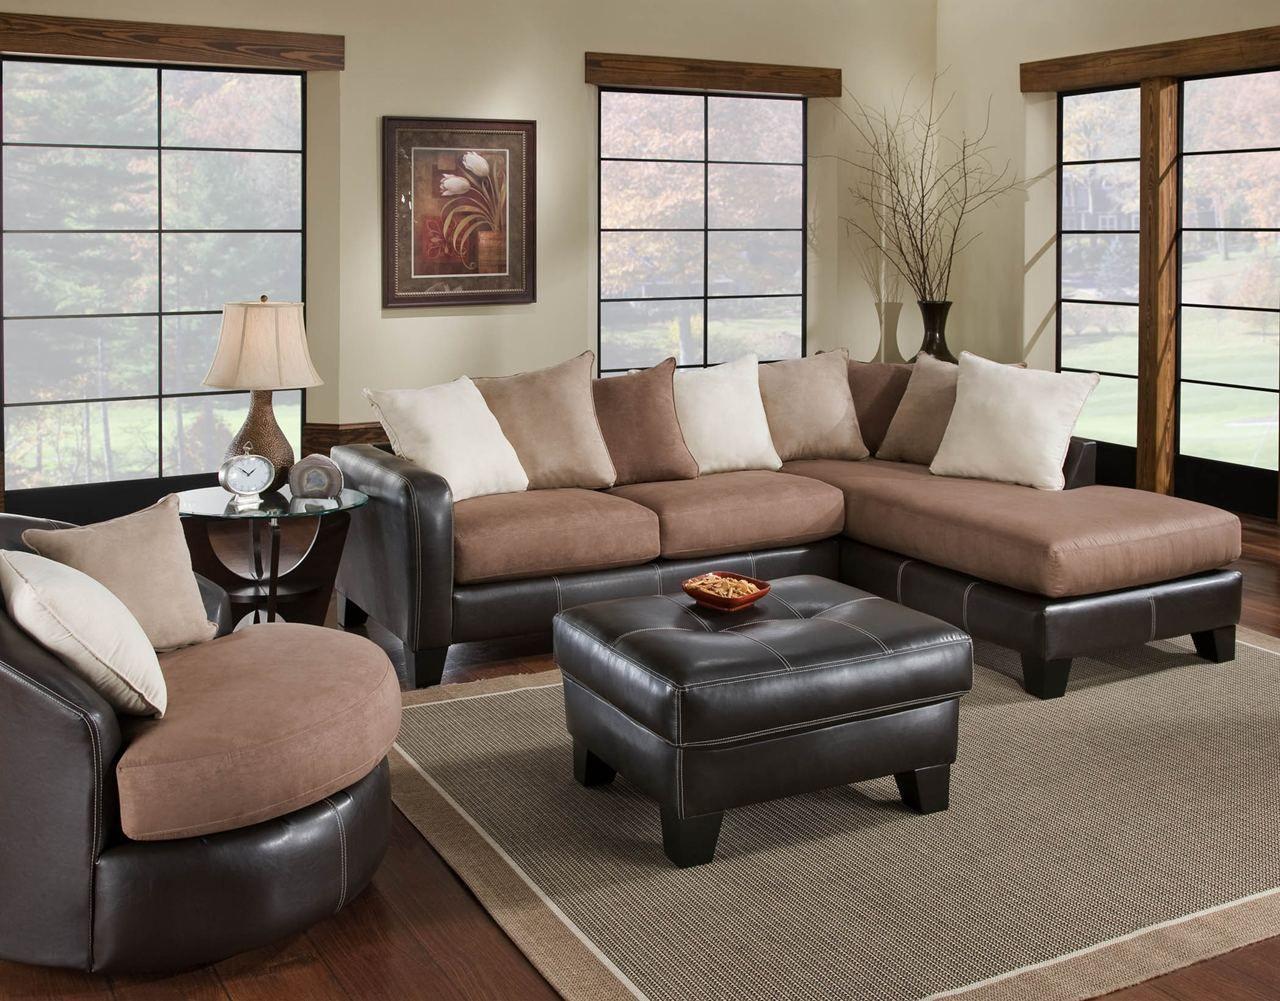 Platin-esszimmer-sets  maximize the living room furniture sets cheap superb cheap